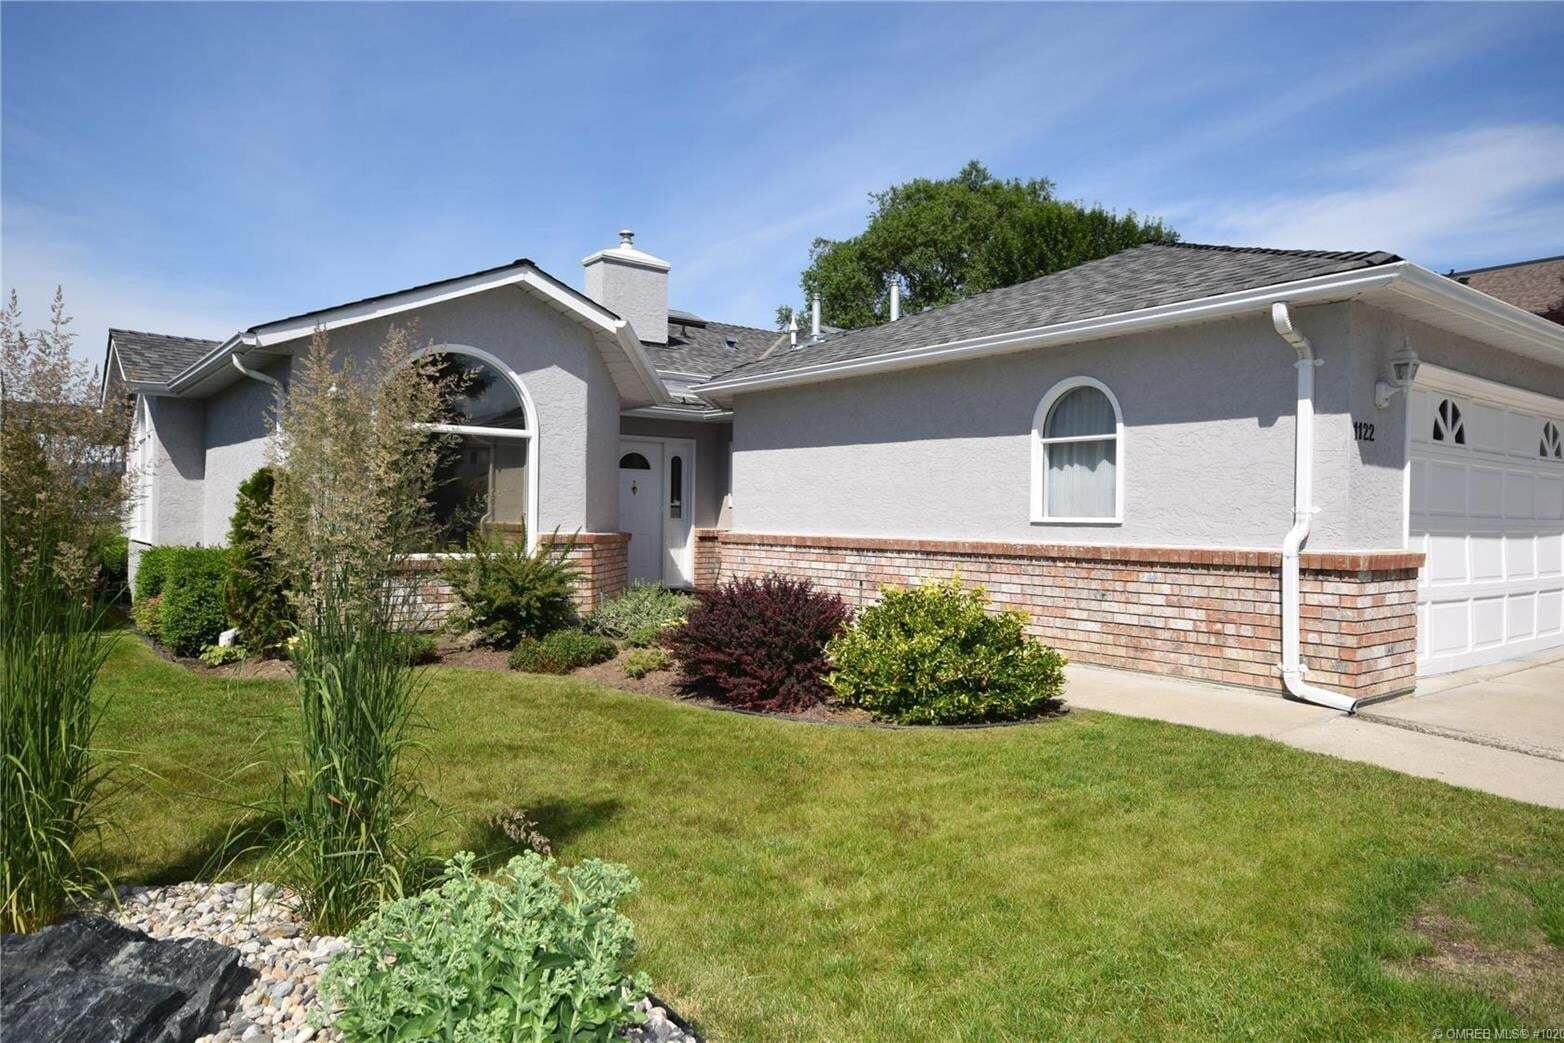 House for sale at 1122 Lanfranco Rd Kelowna British Columbia - MLS: 10201456